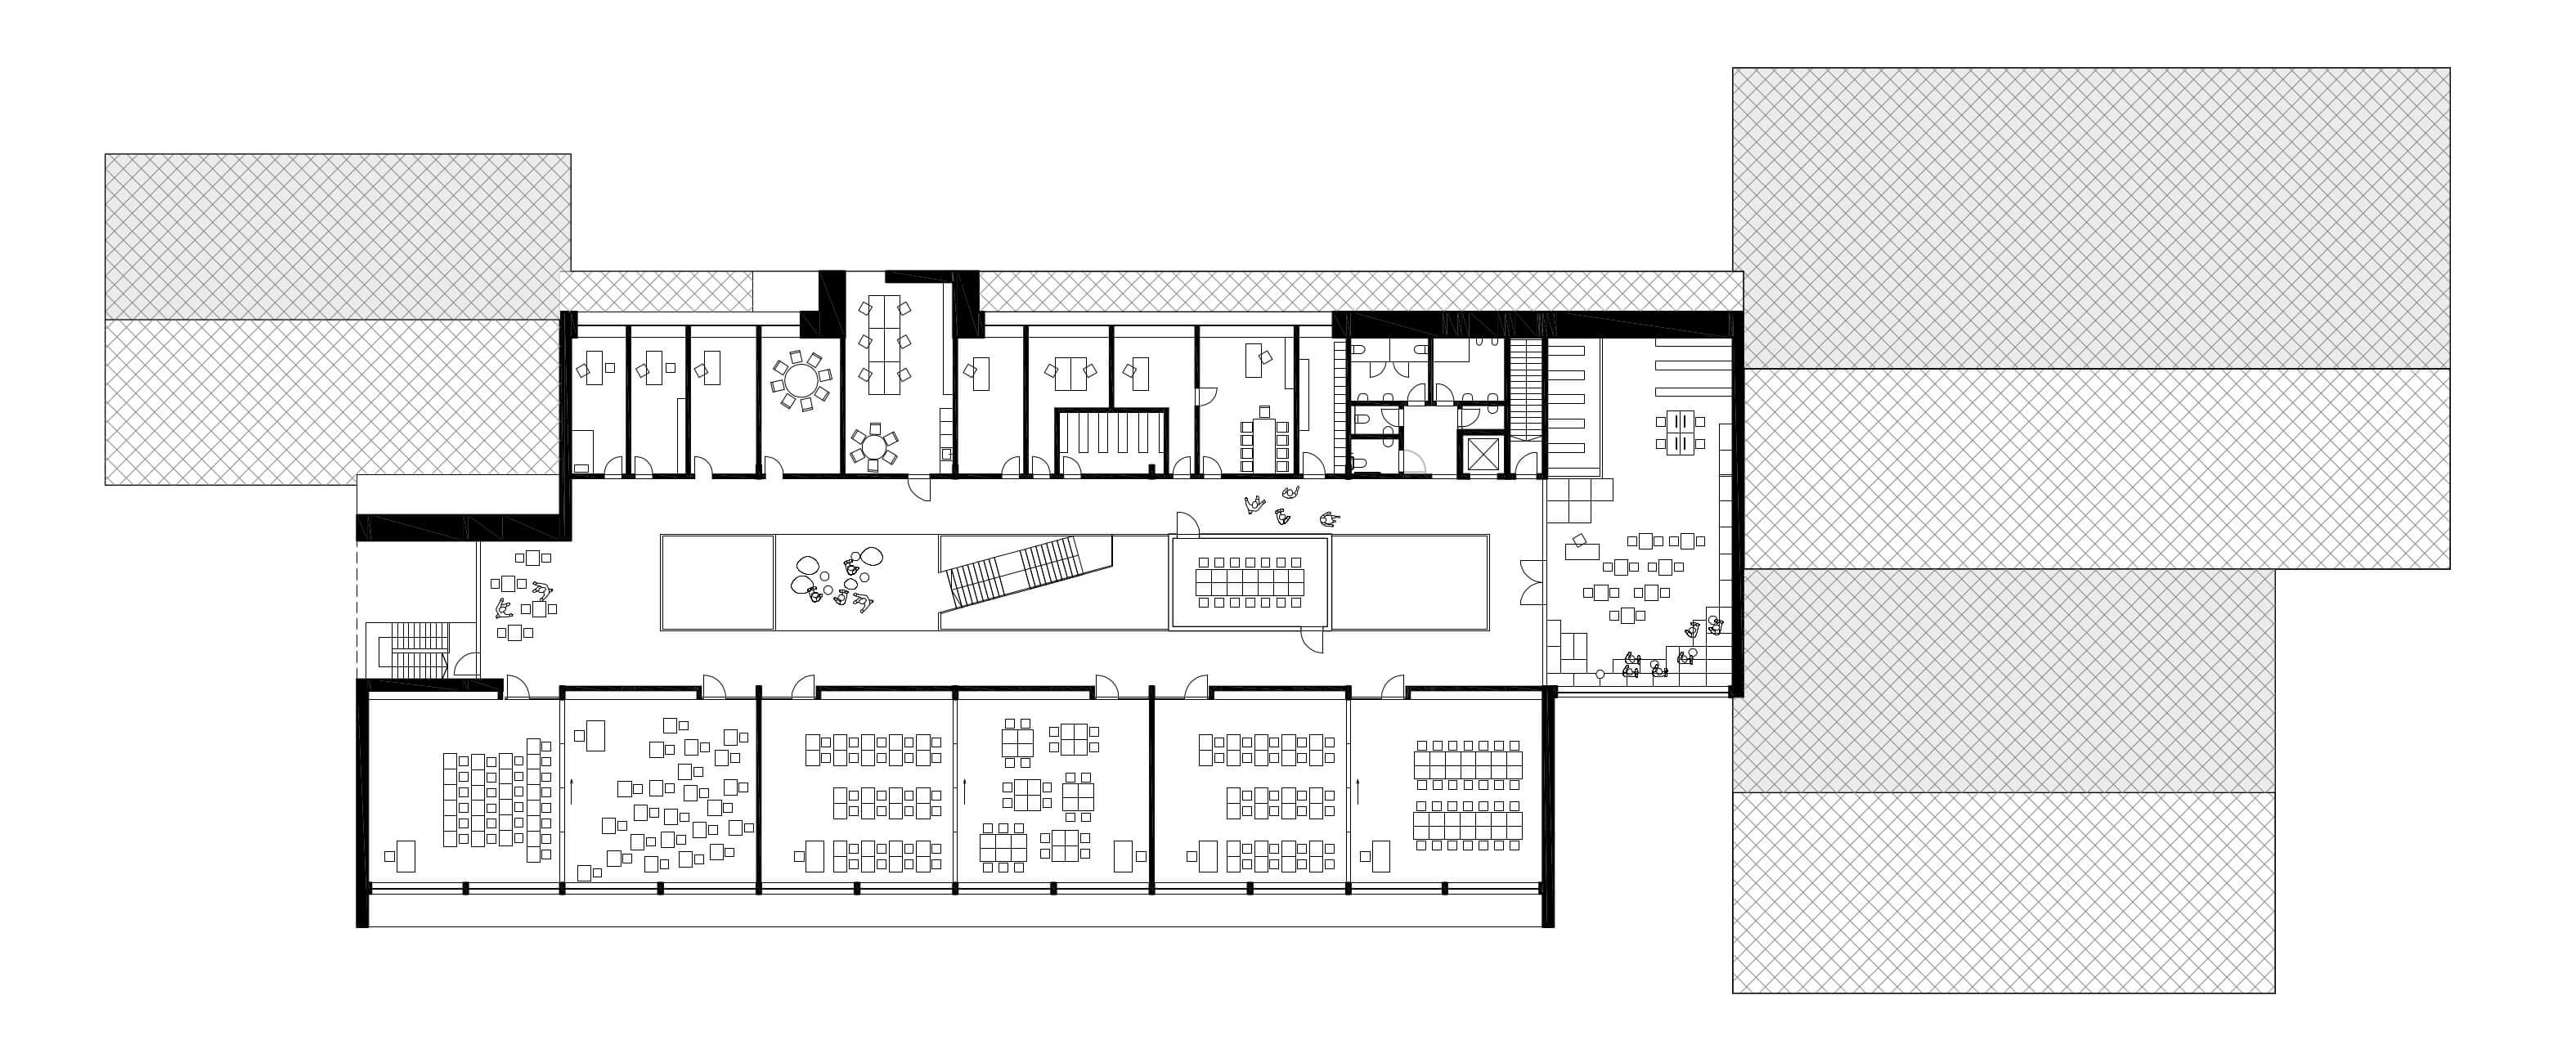 GAISS-arhitekti-Mezaparka-sakumskola-plan-02